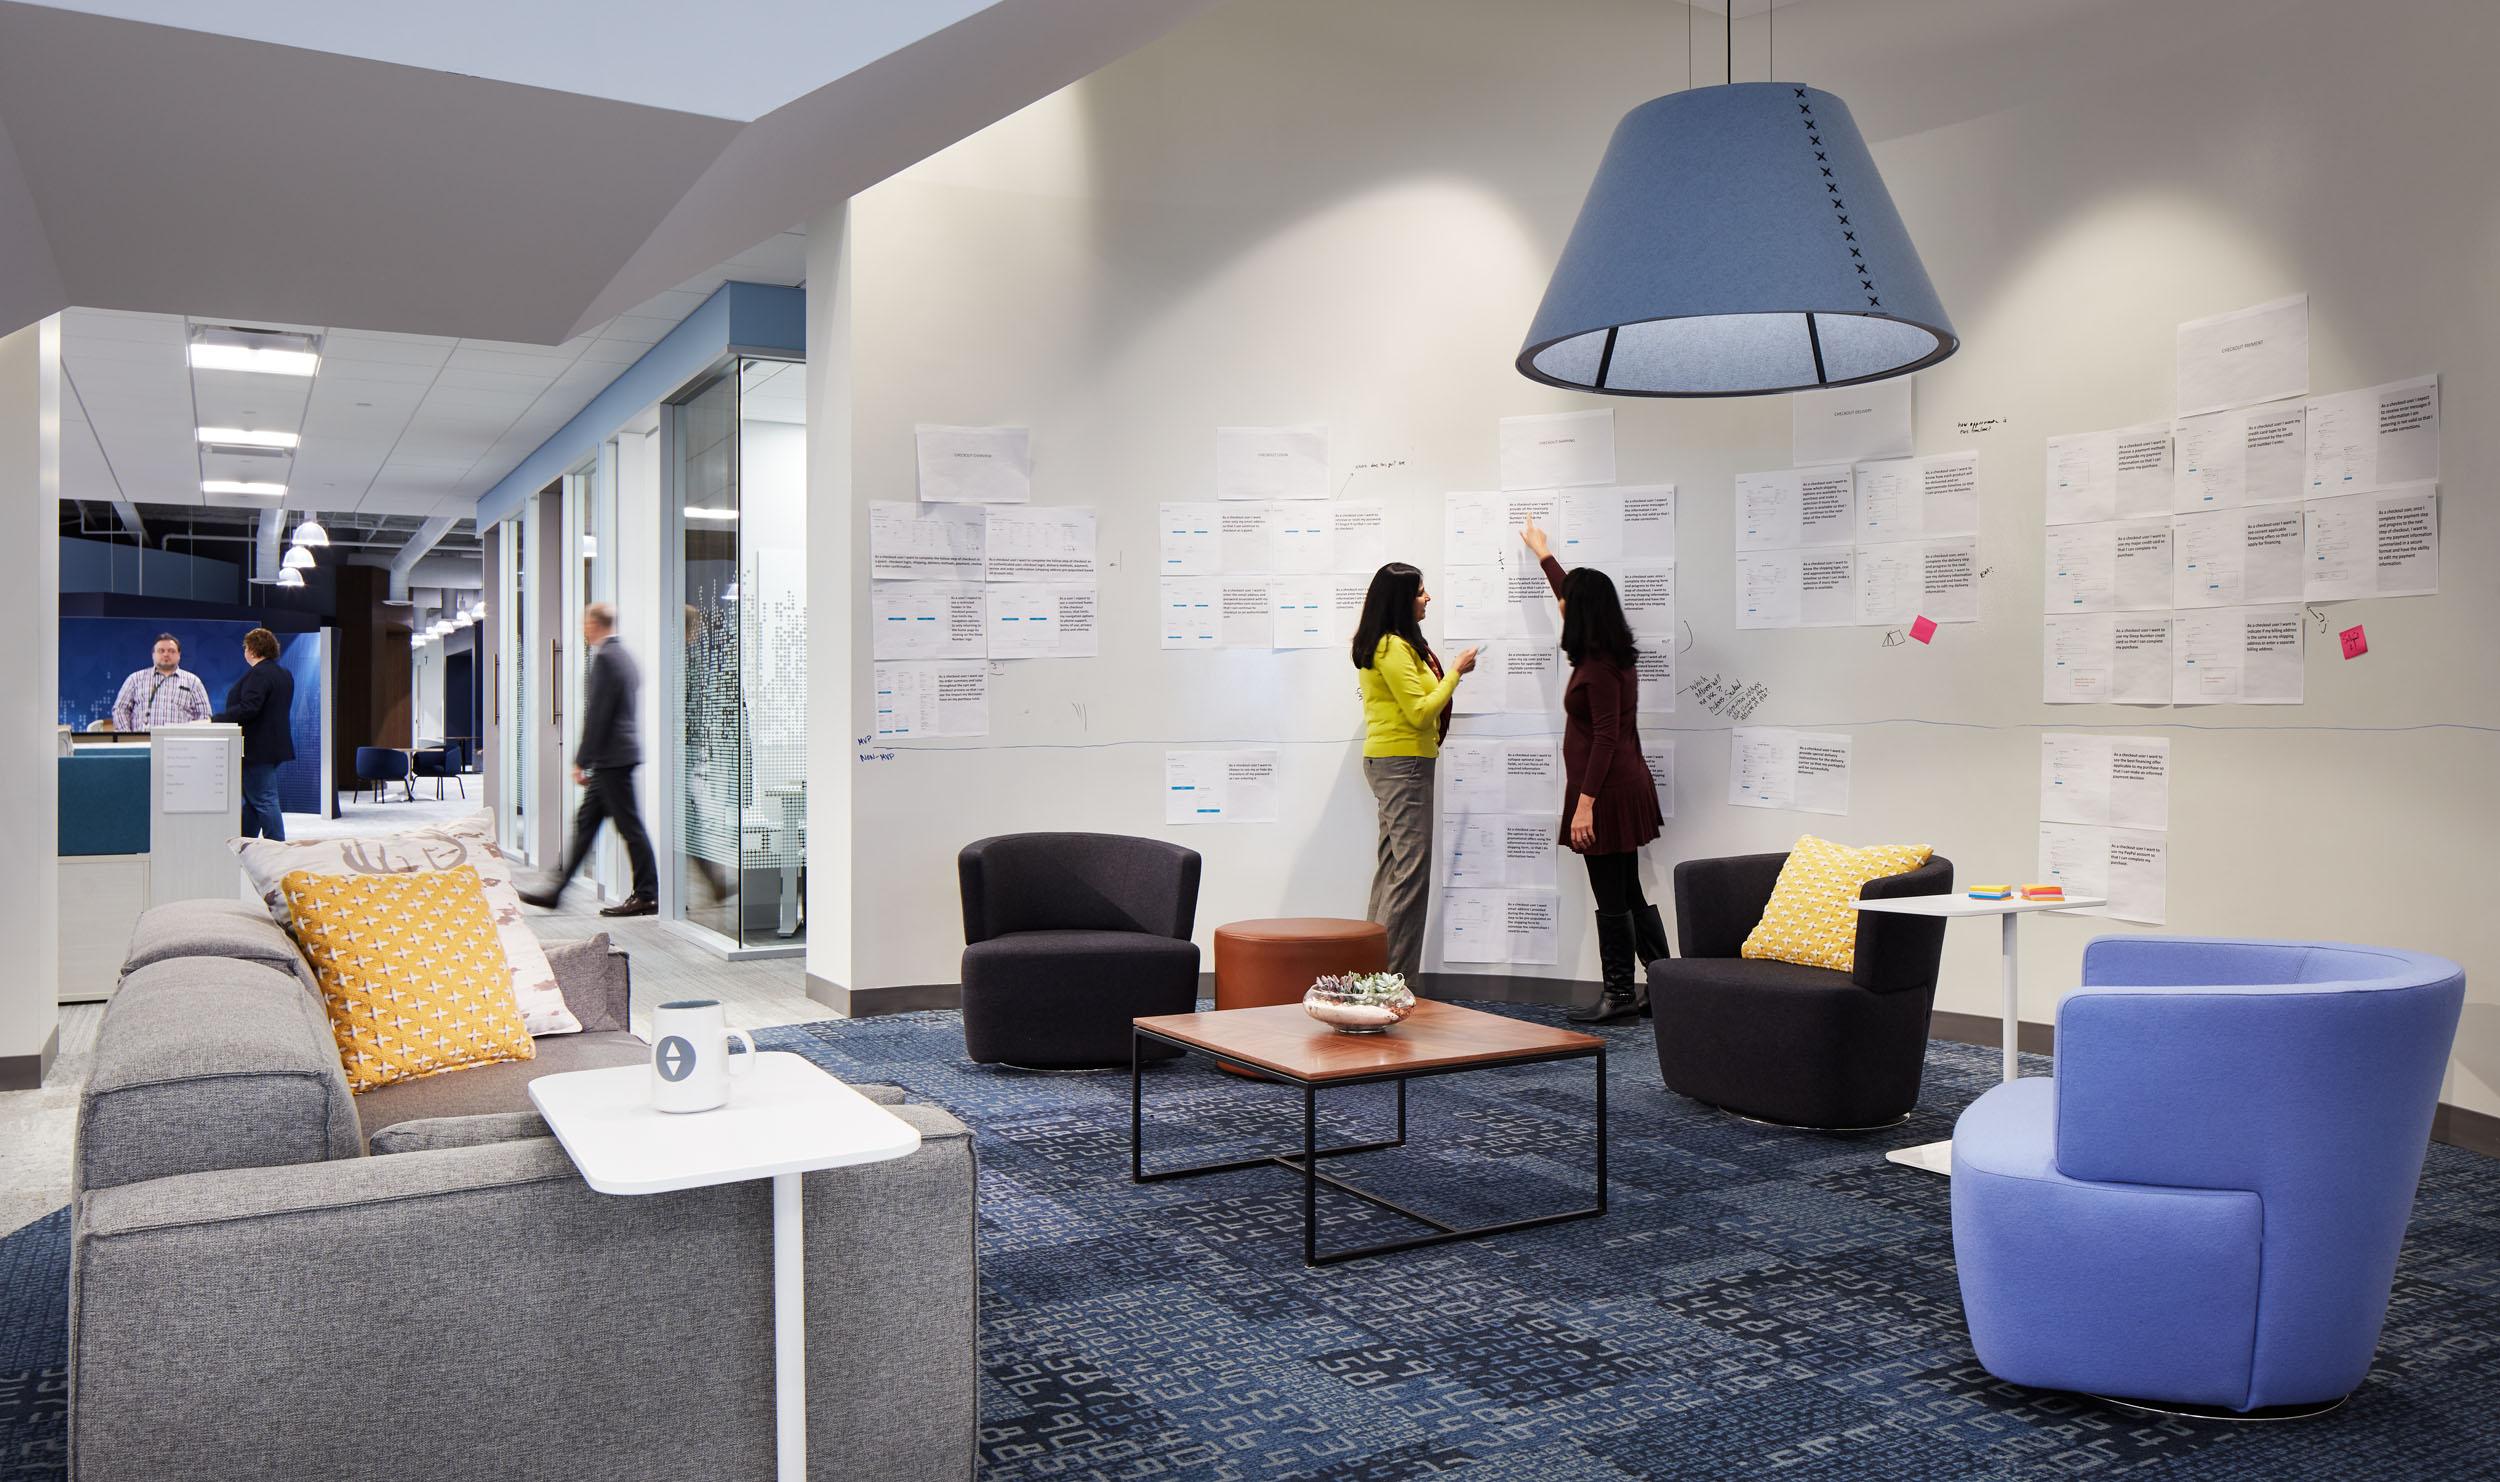 Sleep Number Headquarters interior collaboration space 2